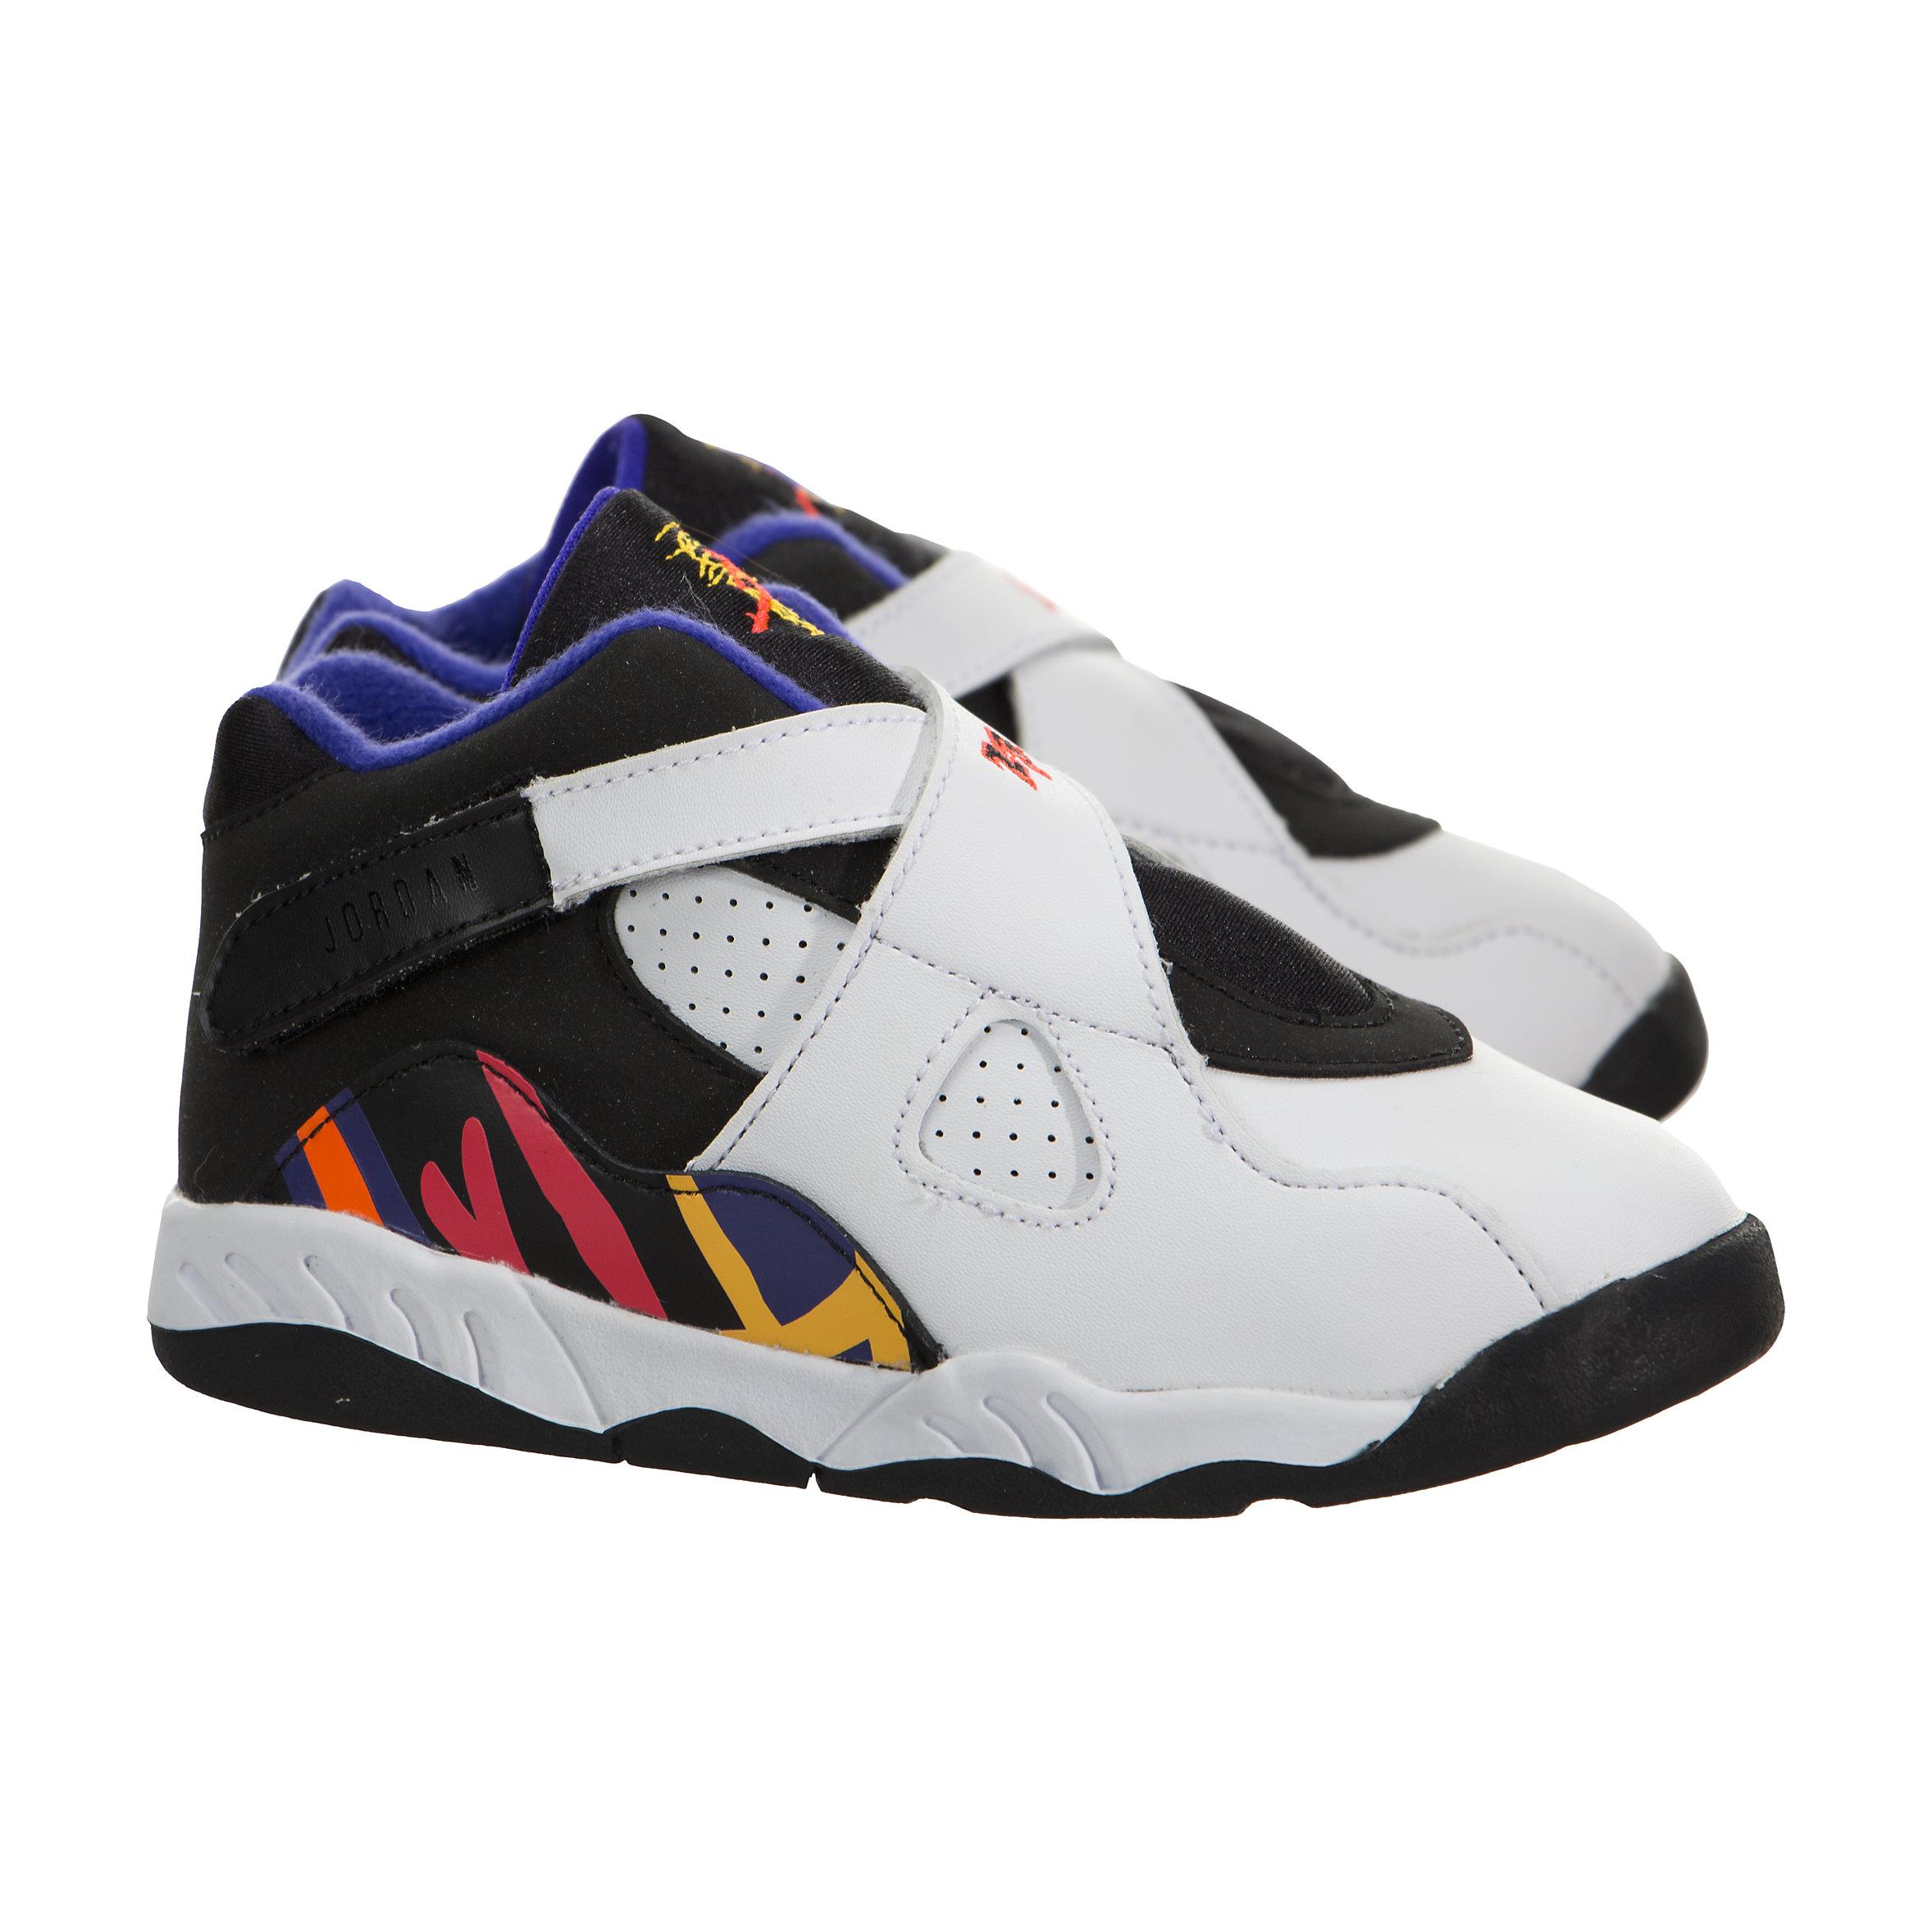 huge discount 683f4 f5494 nike air jordan 1 low phoenix suns aj1 mens basketball shoes